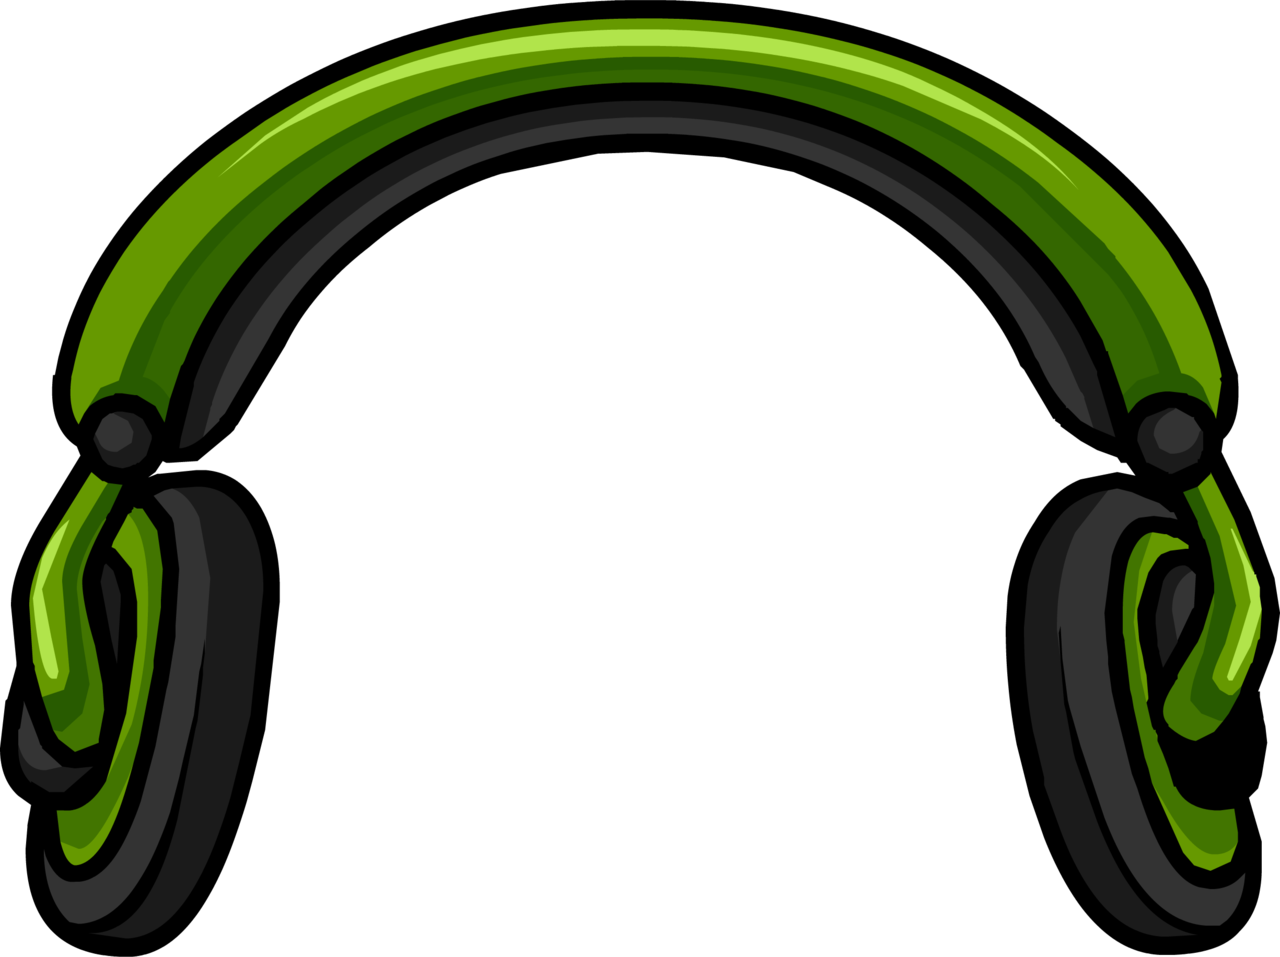 Headphone clipart simple. Image headphones puffle hat